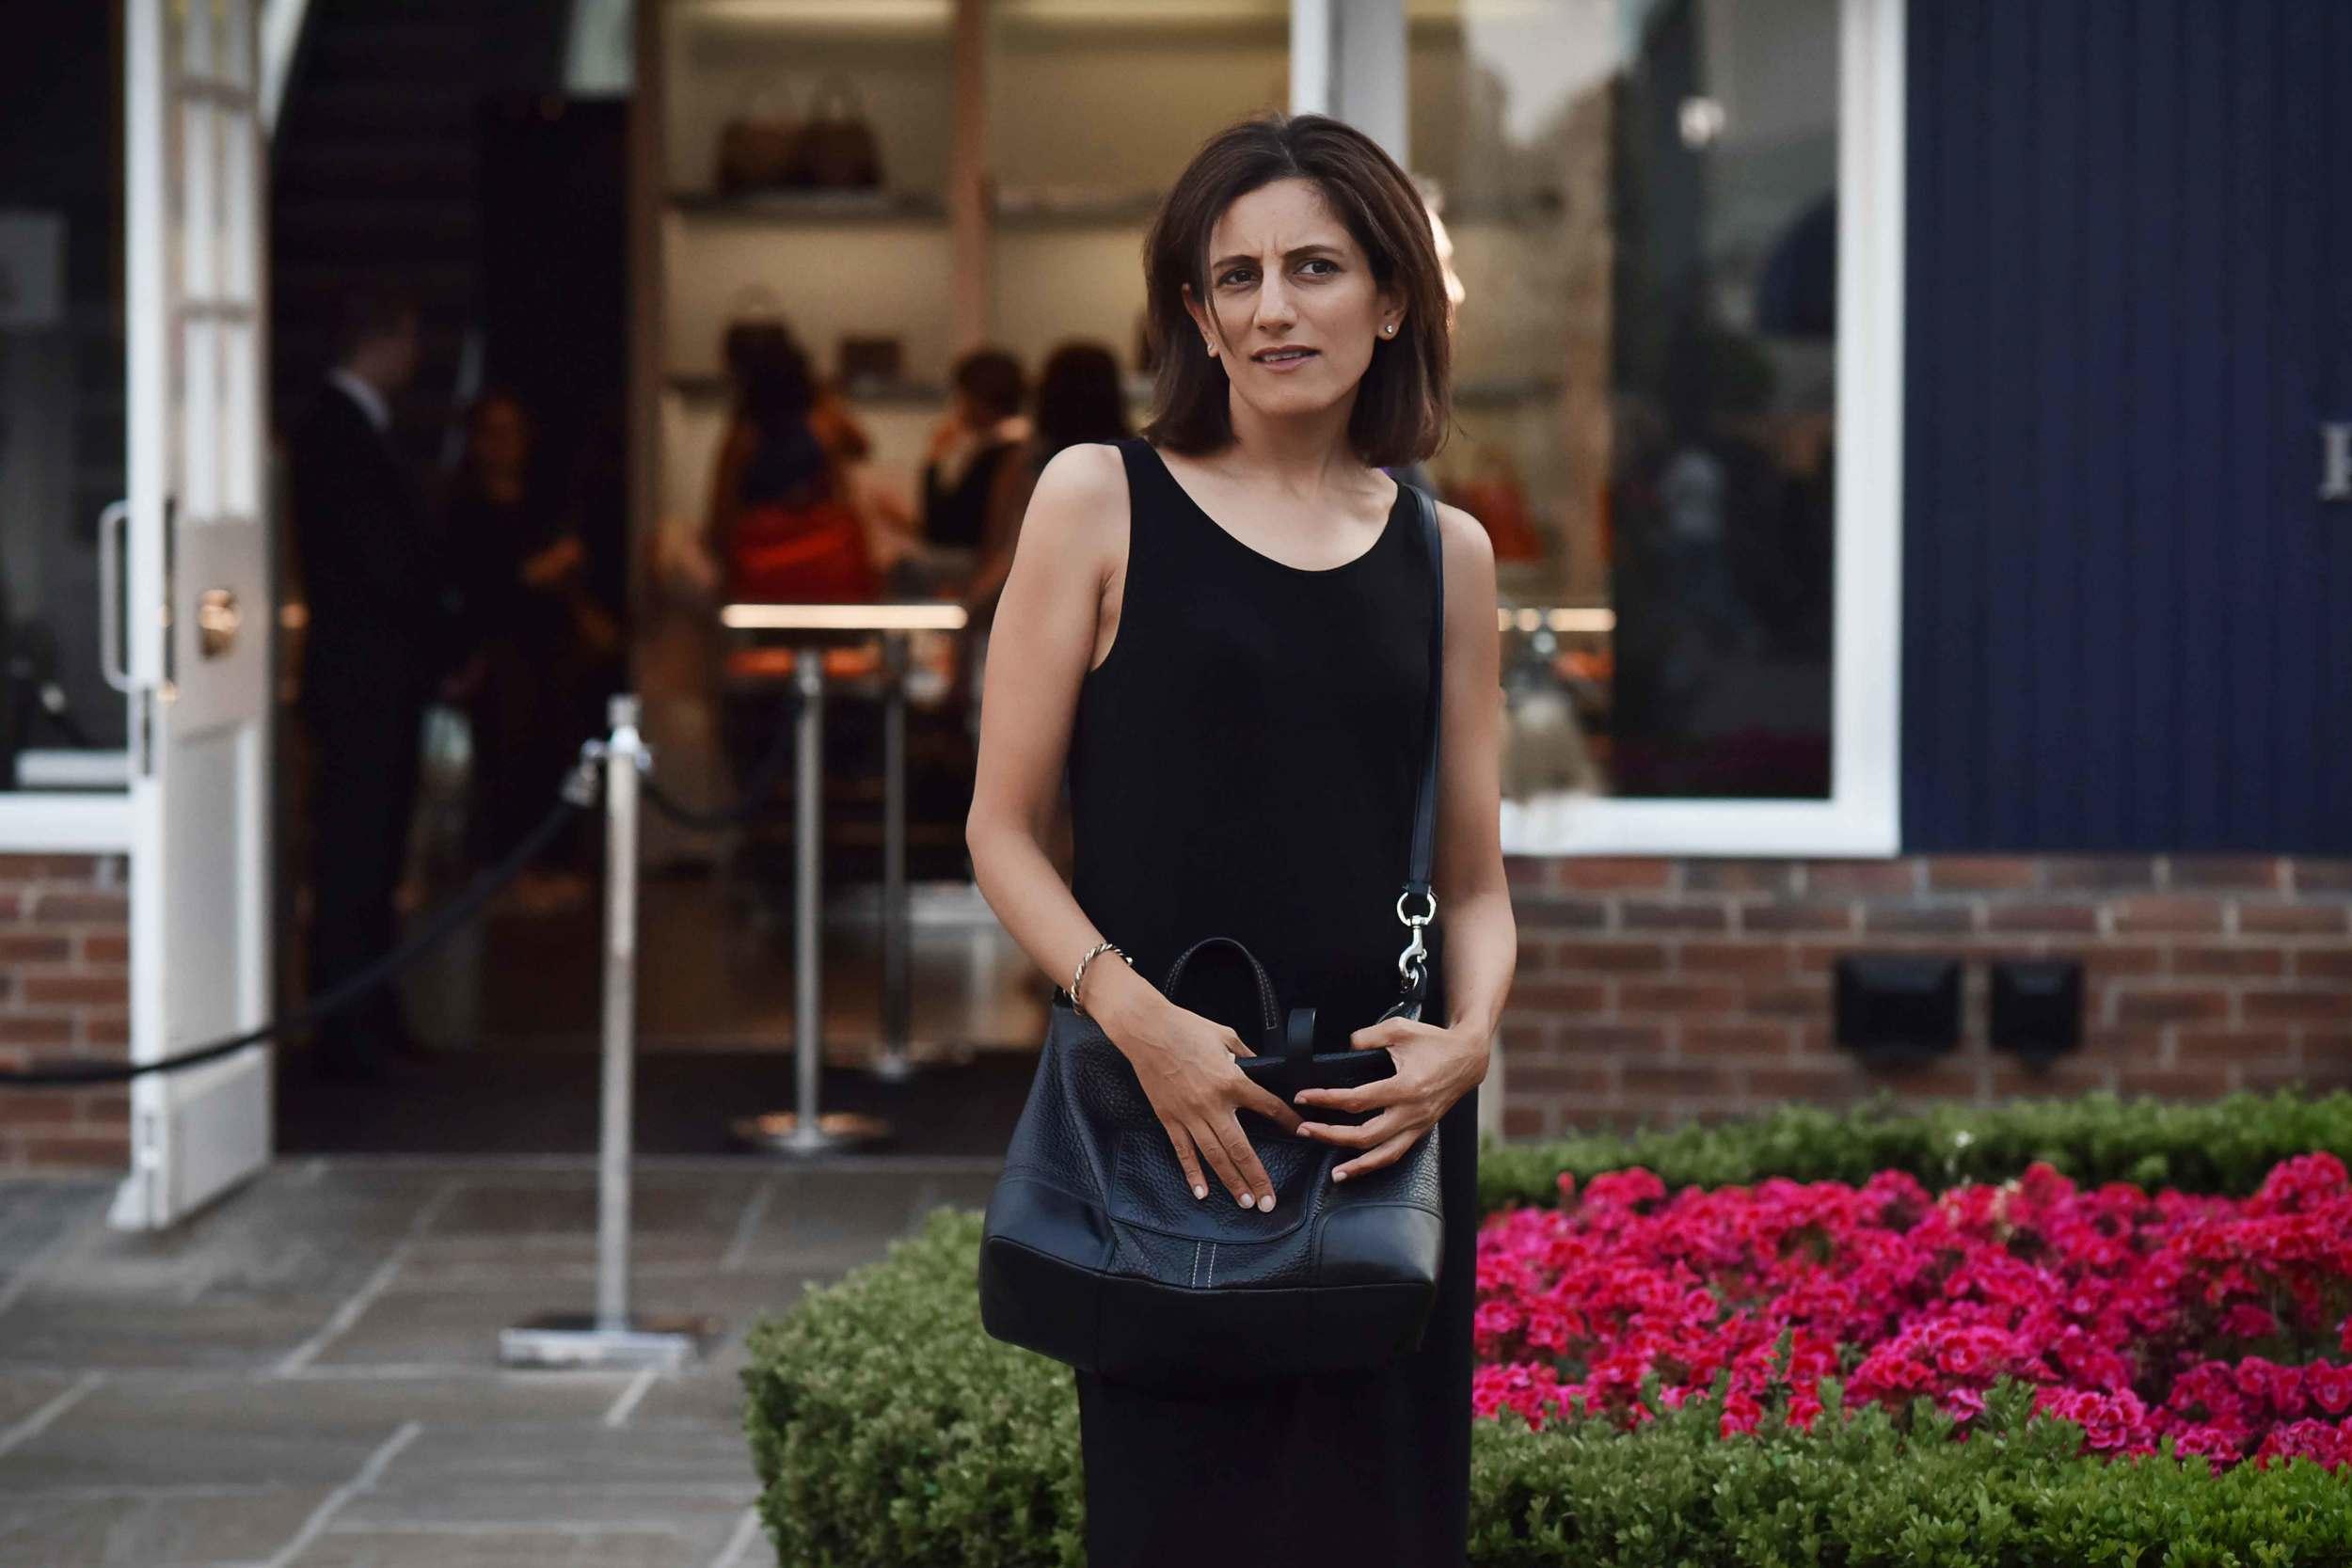 Eileen Fisher jersey black tank dress, Coach crossbody bag, Bicester Village. Image©sourcingstyle.com